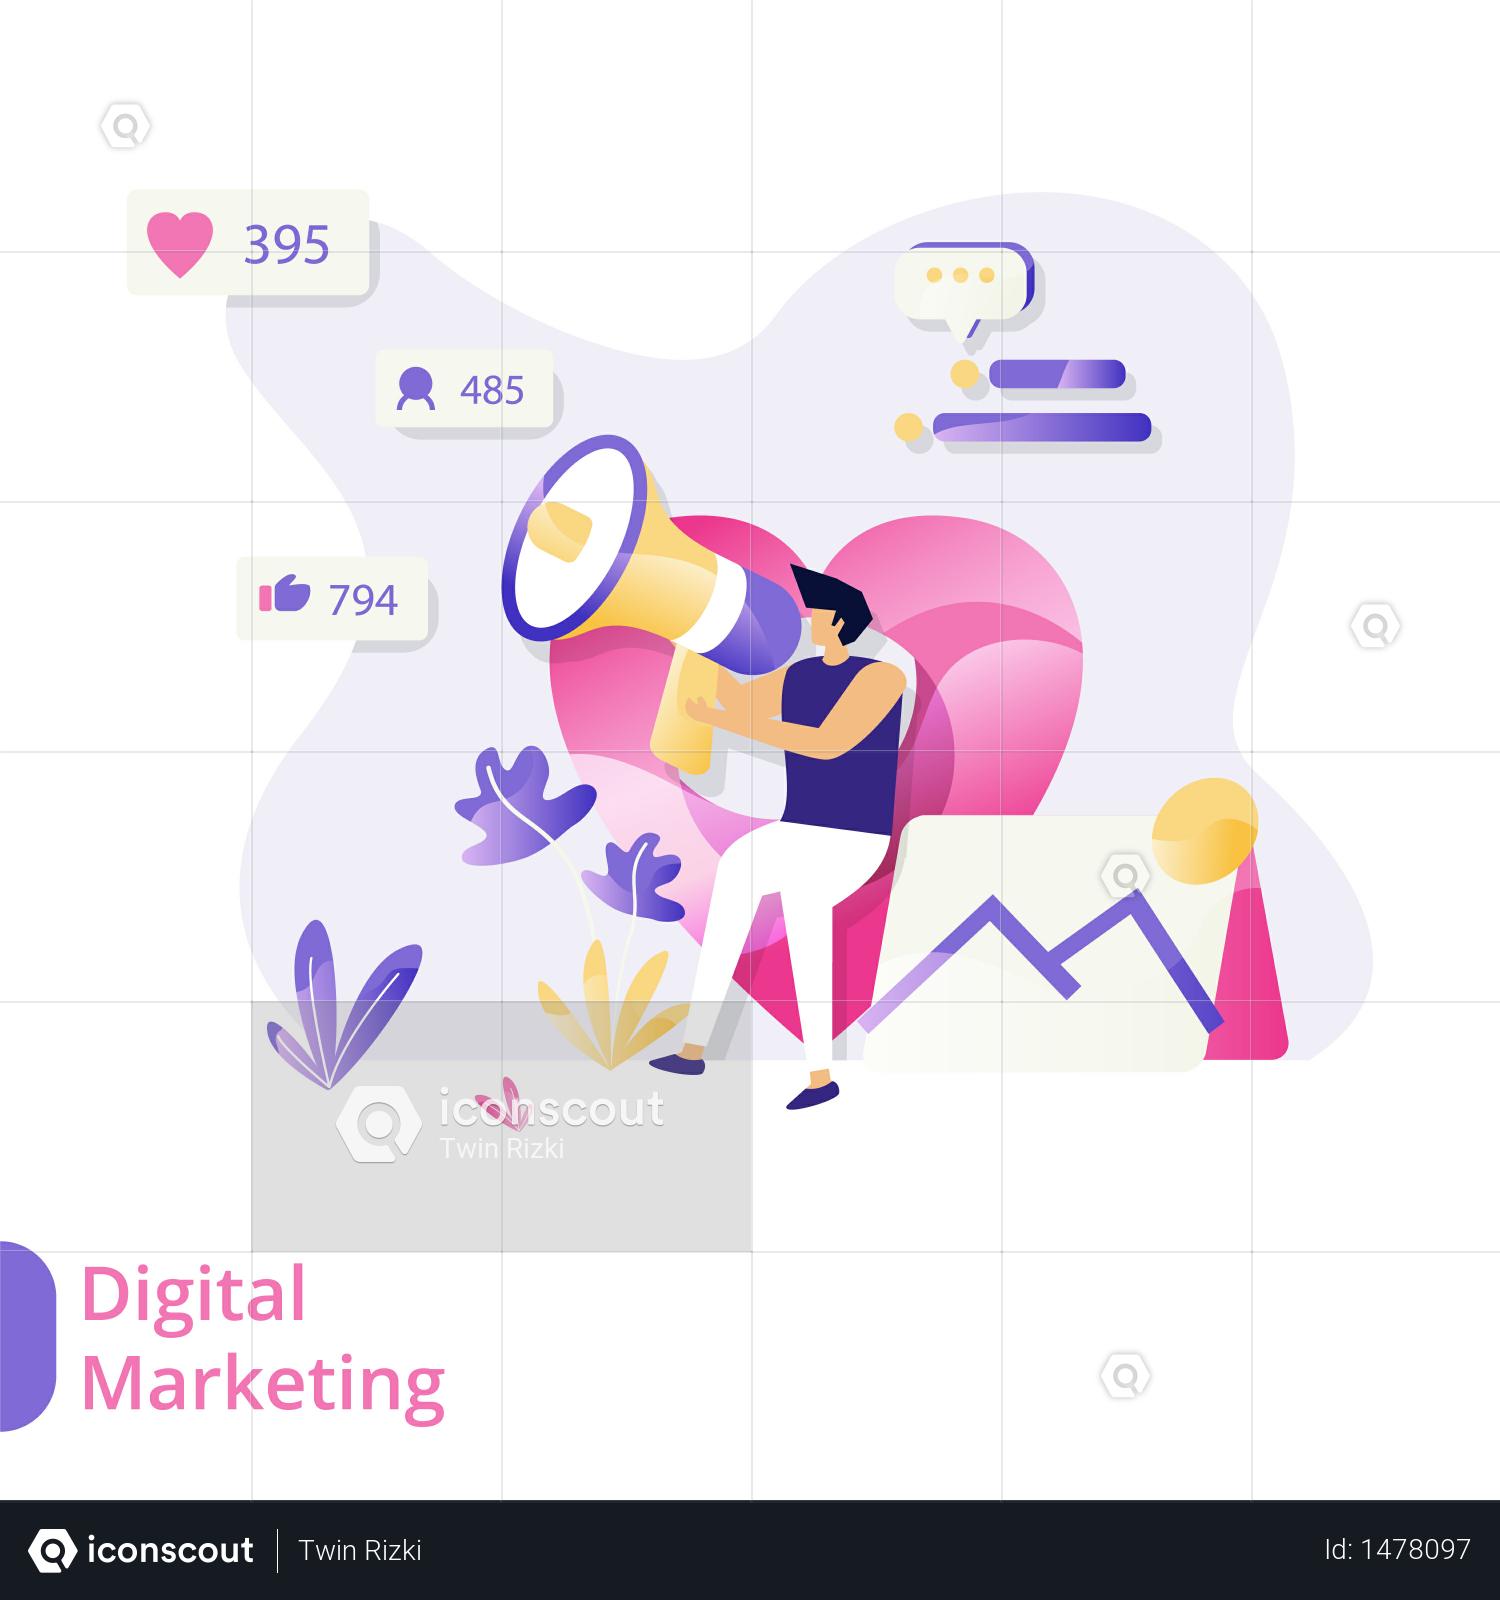 Premium Digital Marketing Illustration Download In Png Vector Format Digital Marketing Business Illustration Illustration